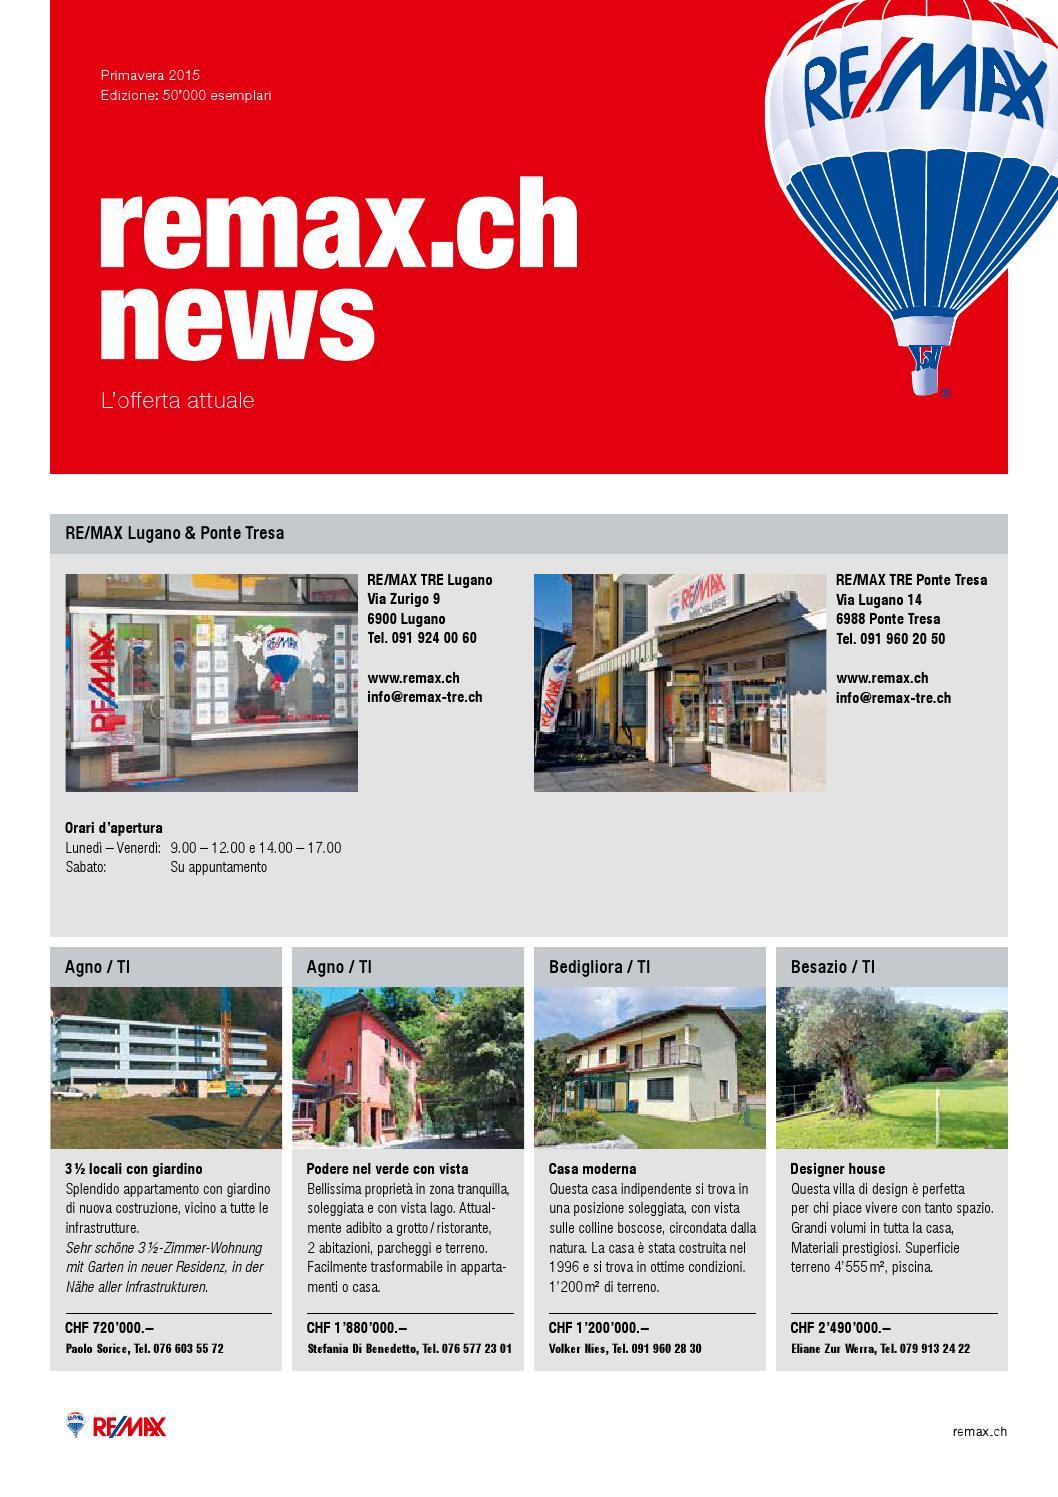 Remax news ticino primavera 2015 by beni stocker issuu for Casa moderna zurigo